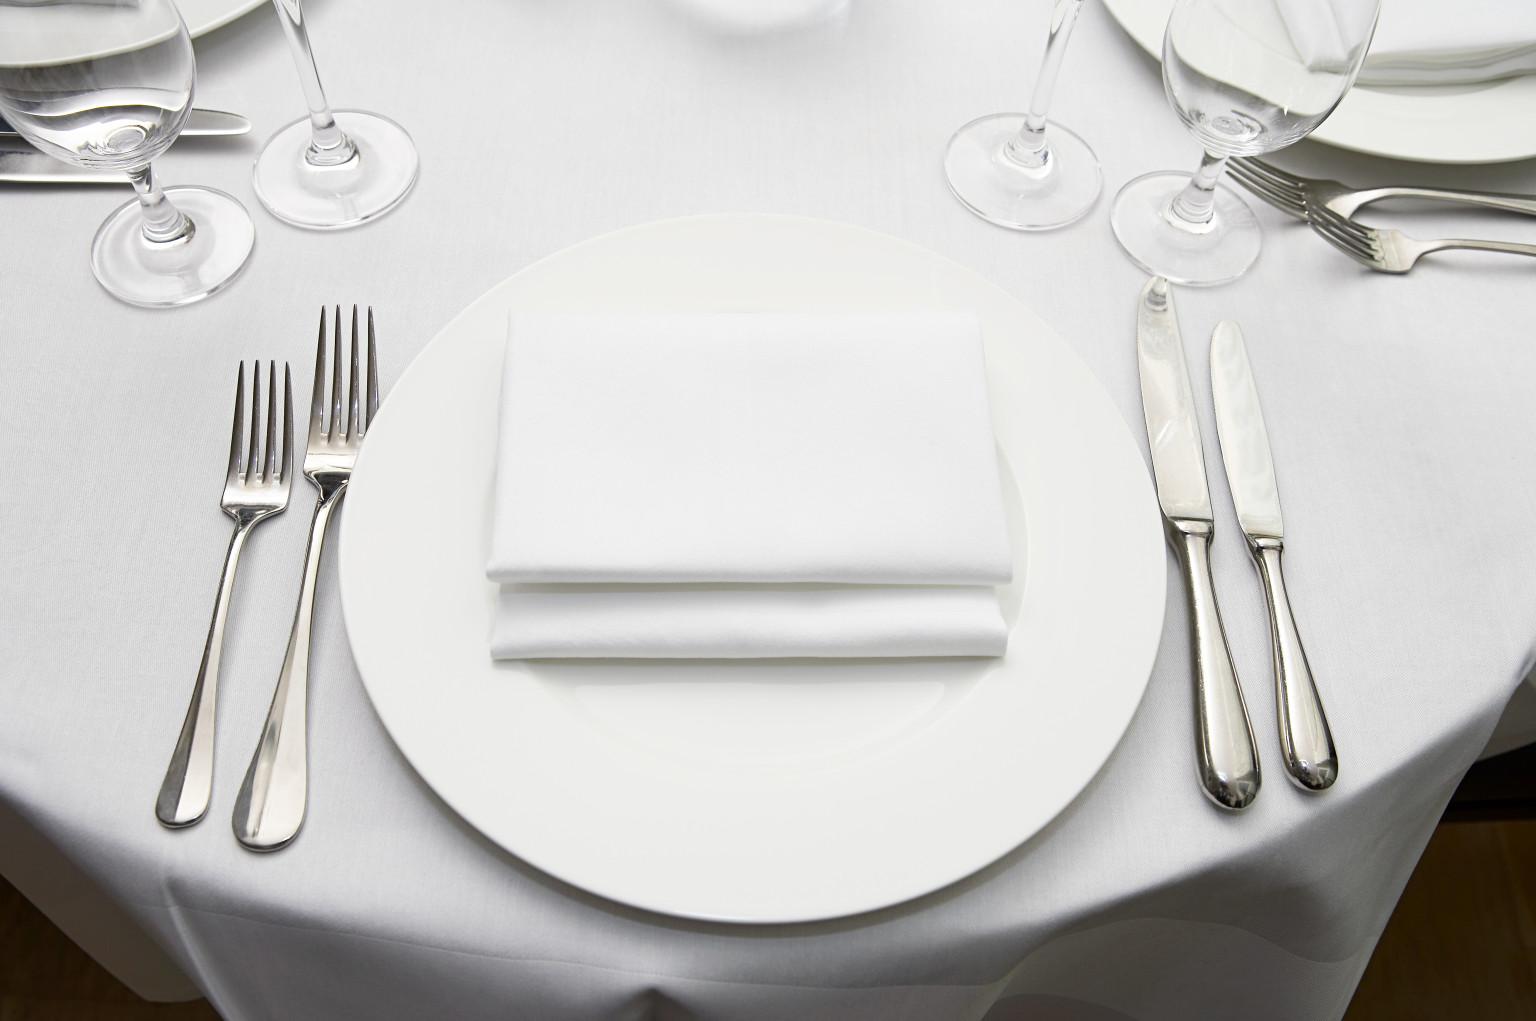 Fine dining restaurant table setup - Fine Dining Restaurant Table Setup 20